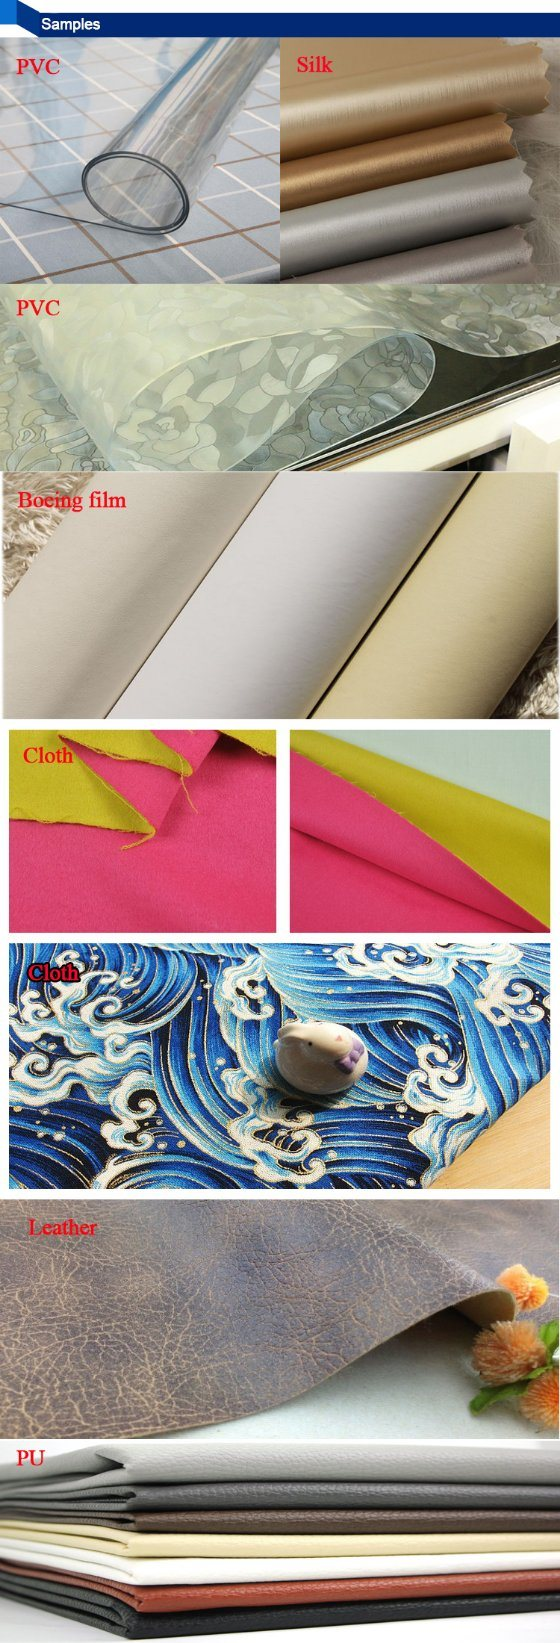 Cortadora profesional del laser del CO2 de la materia textil de cuero de la tela de la talla grande profesional